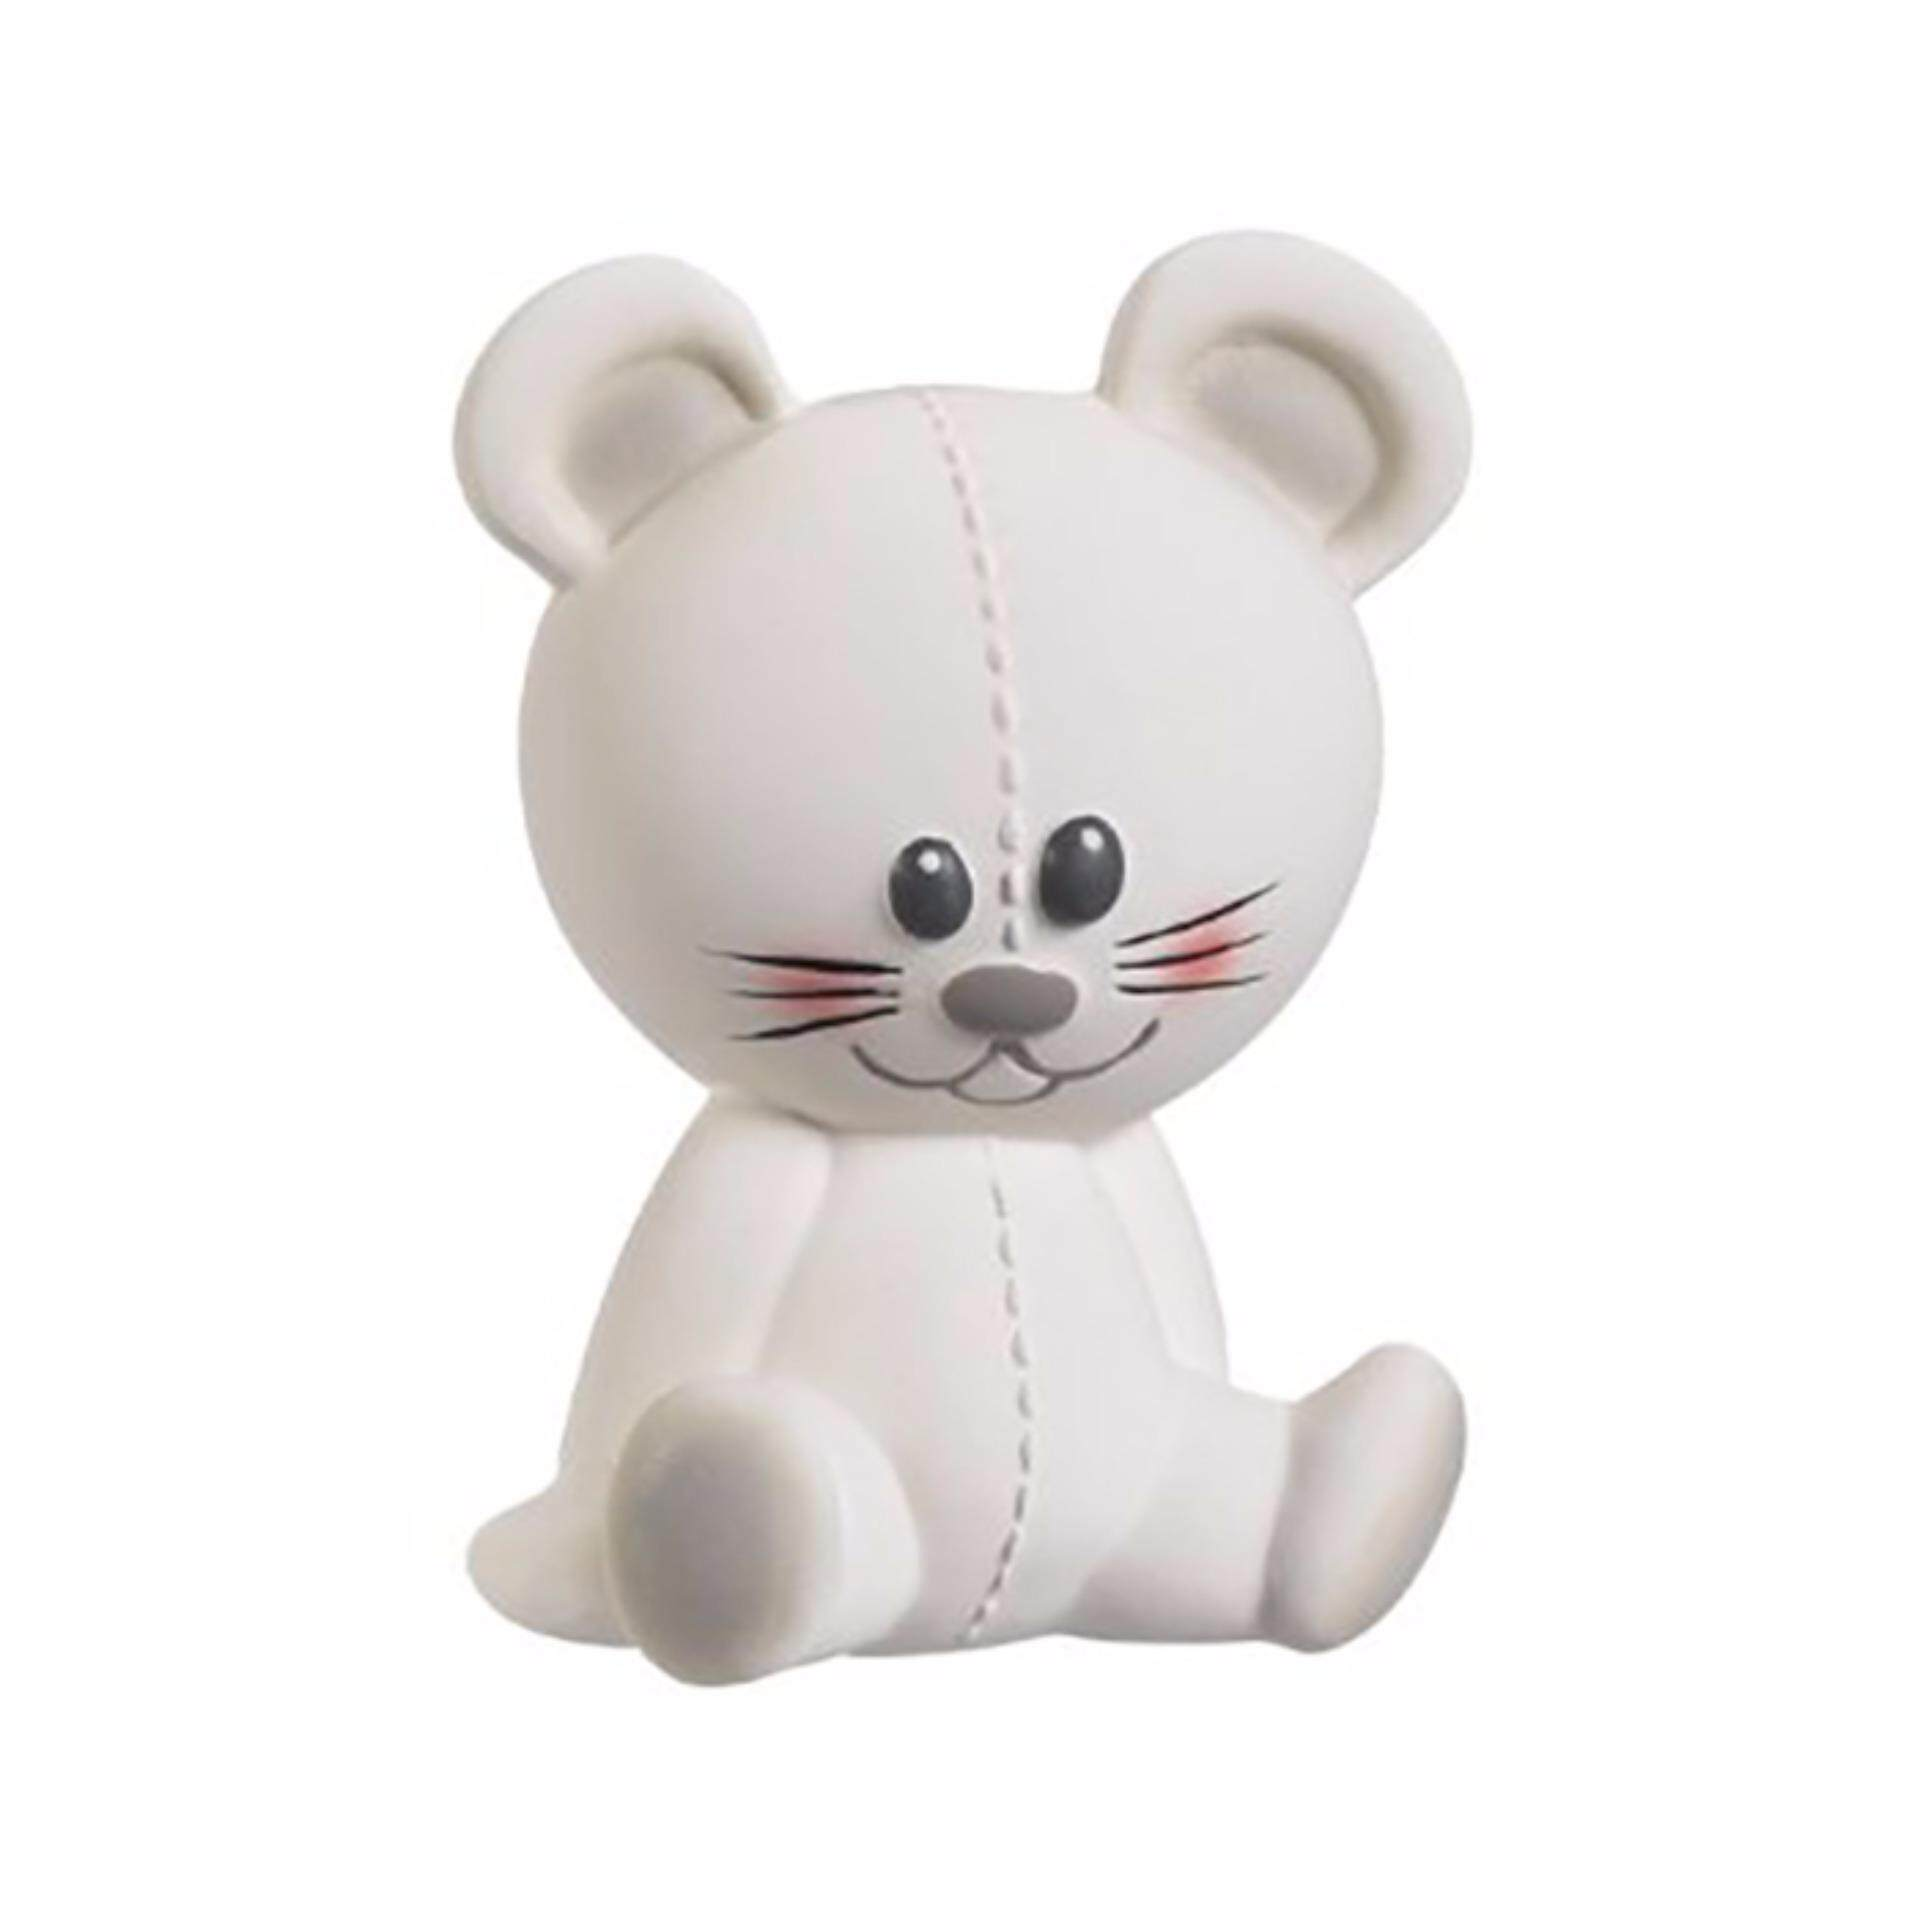 [FRANCE - SOPHIE LA GIRAFE] Josphine the Mouse Teether (VULLI)